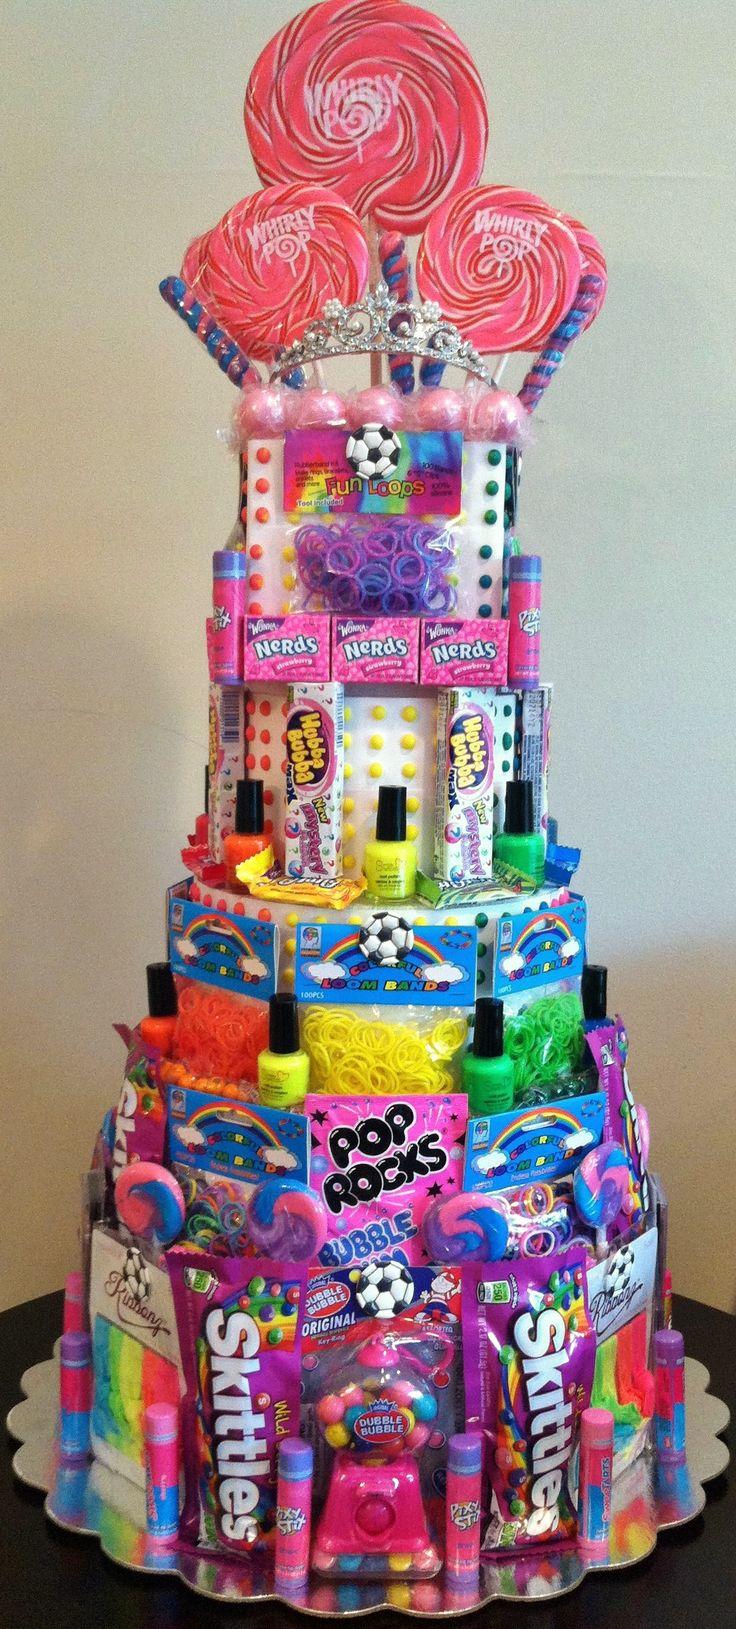 Rainbow Loom Birthday Party! Rainbow Loom Party Favors Candy Cake...I love the idea of a favor cake for any theme